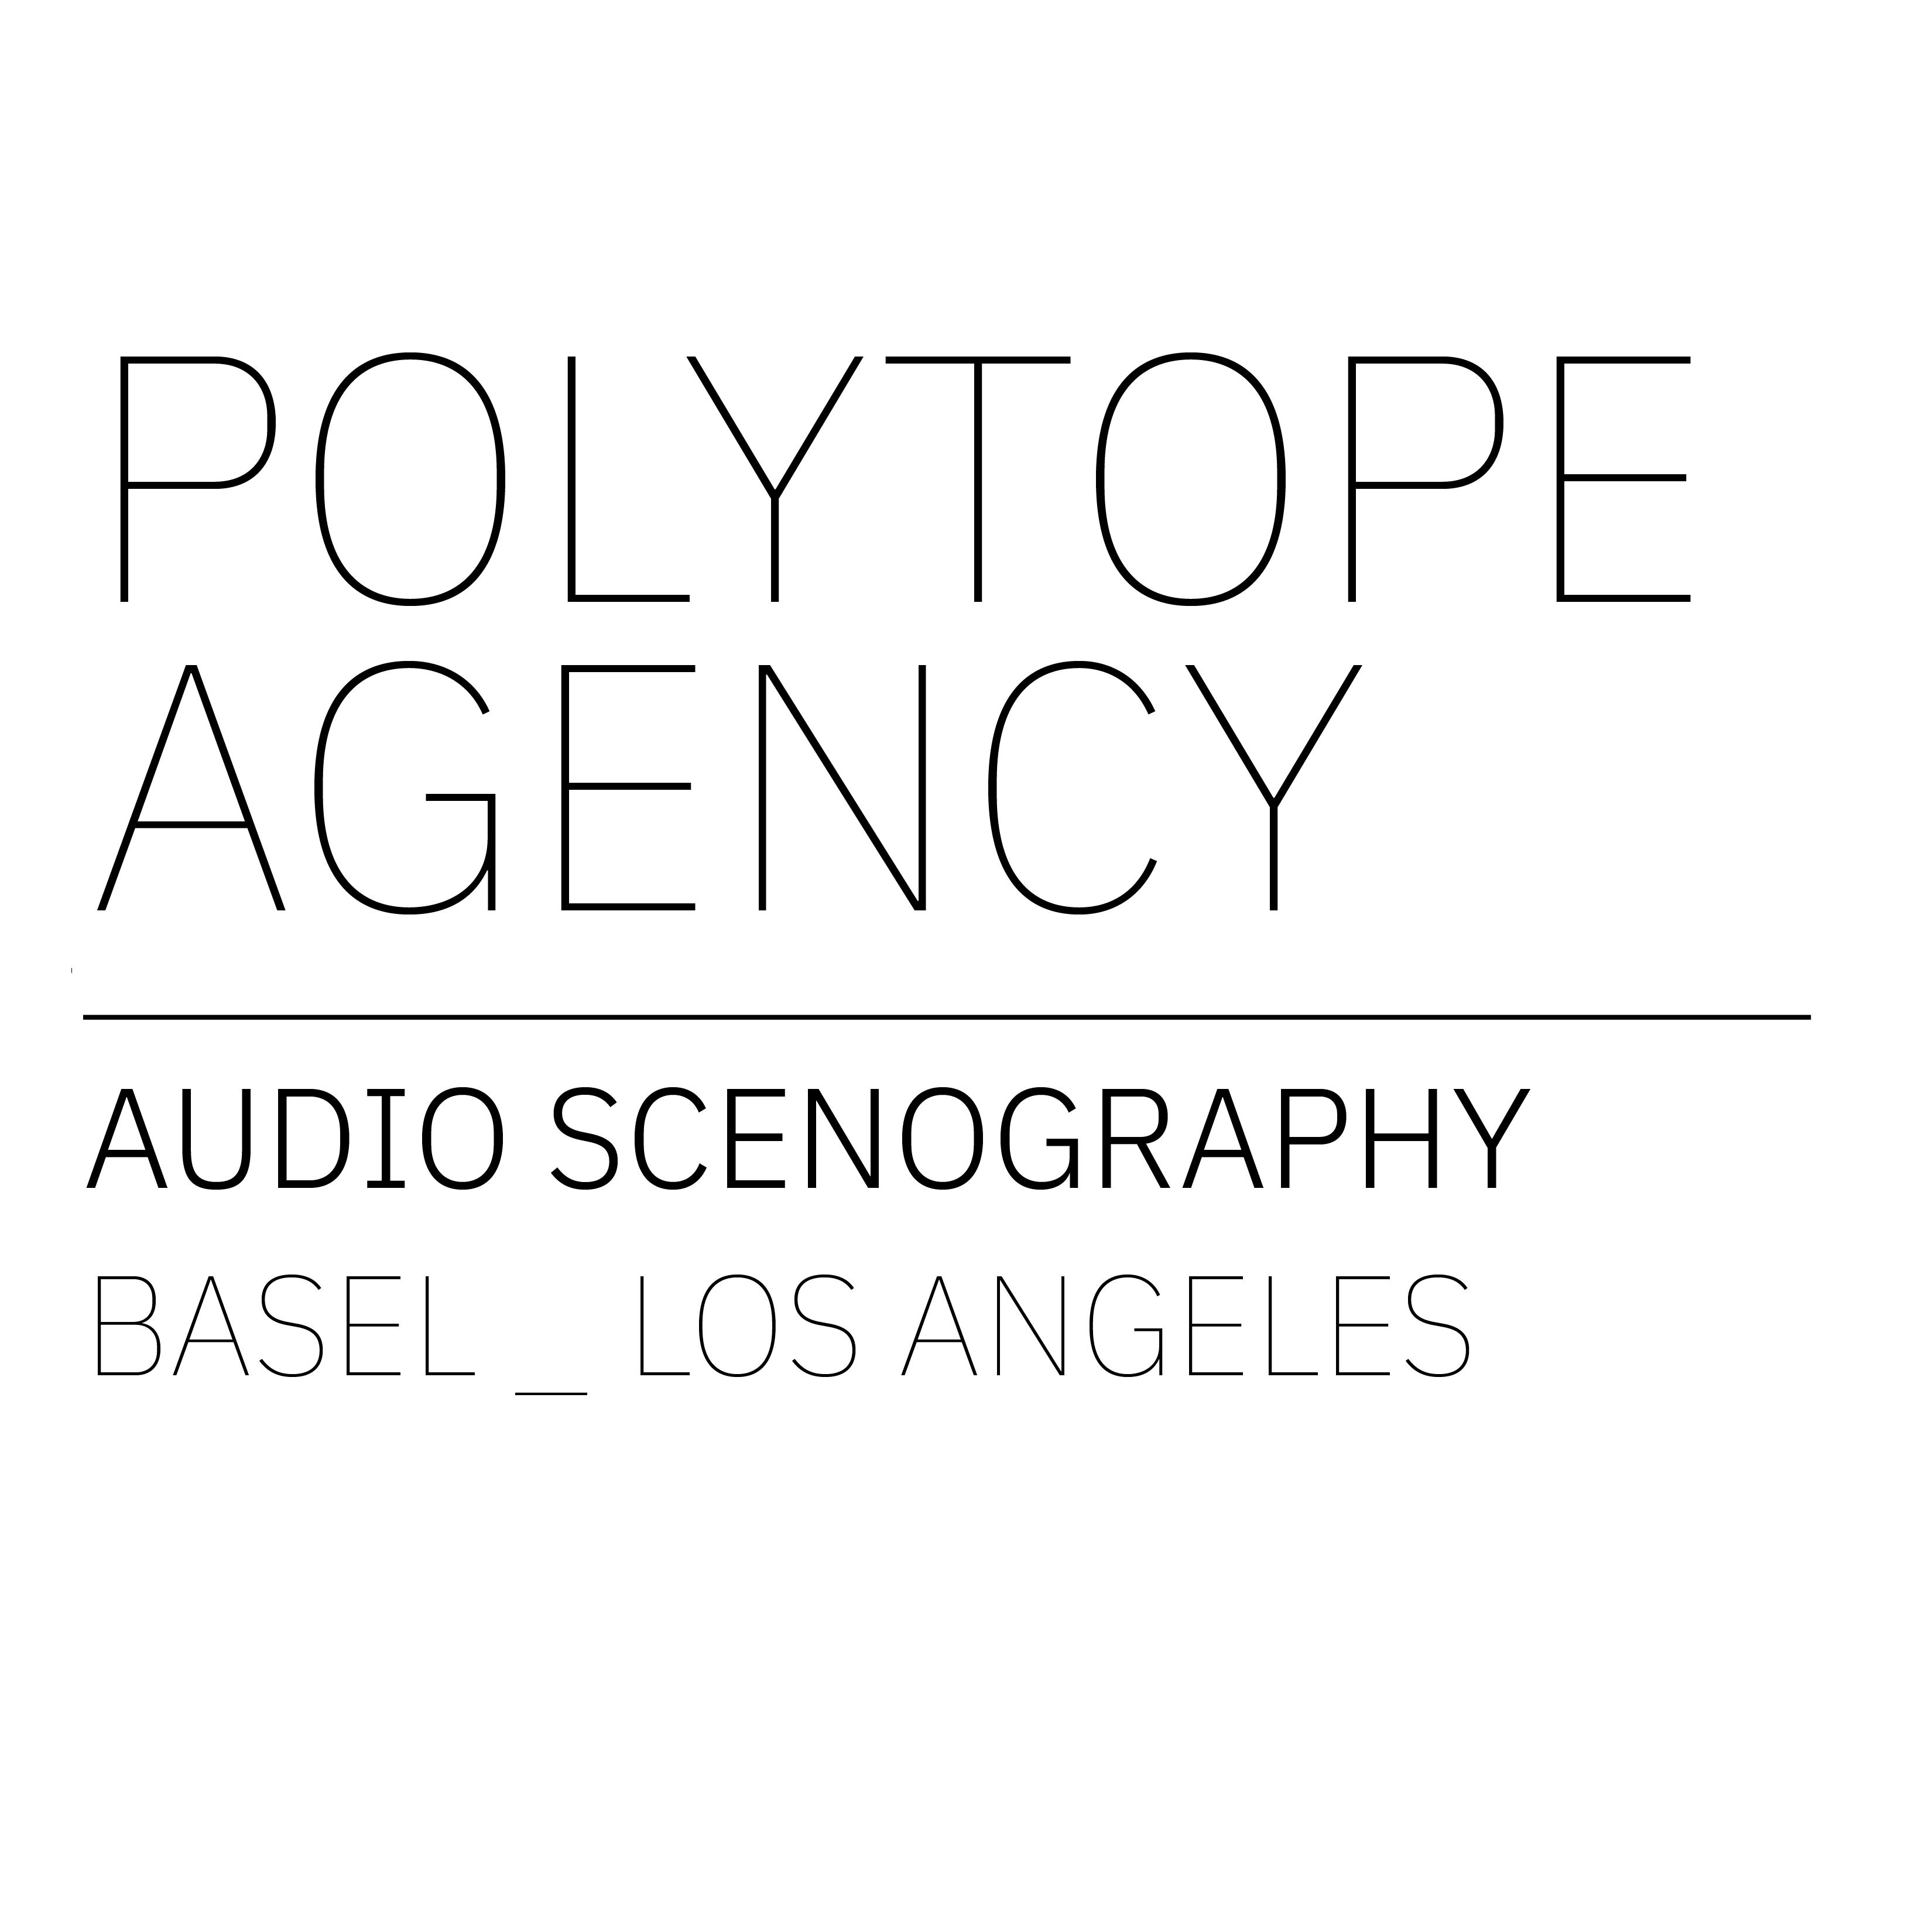 Polytope Agency - Audio Scenography Logo